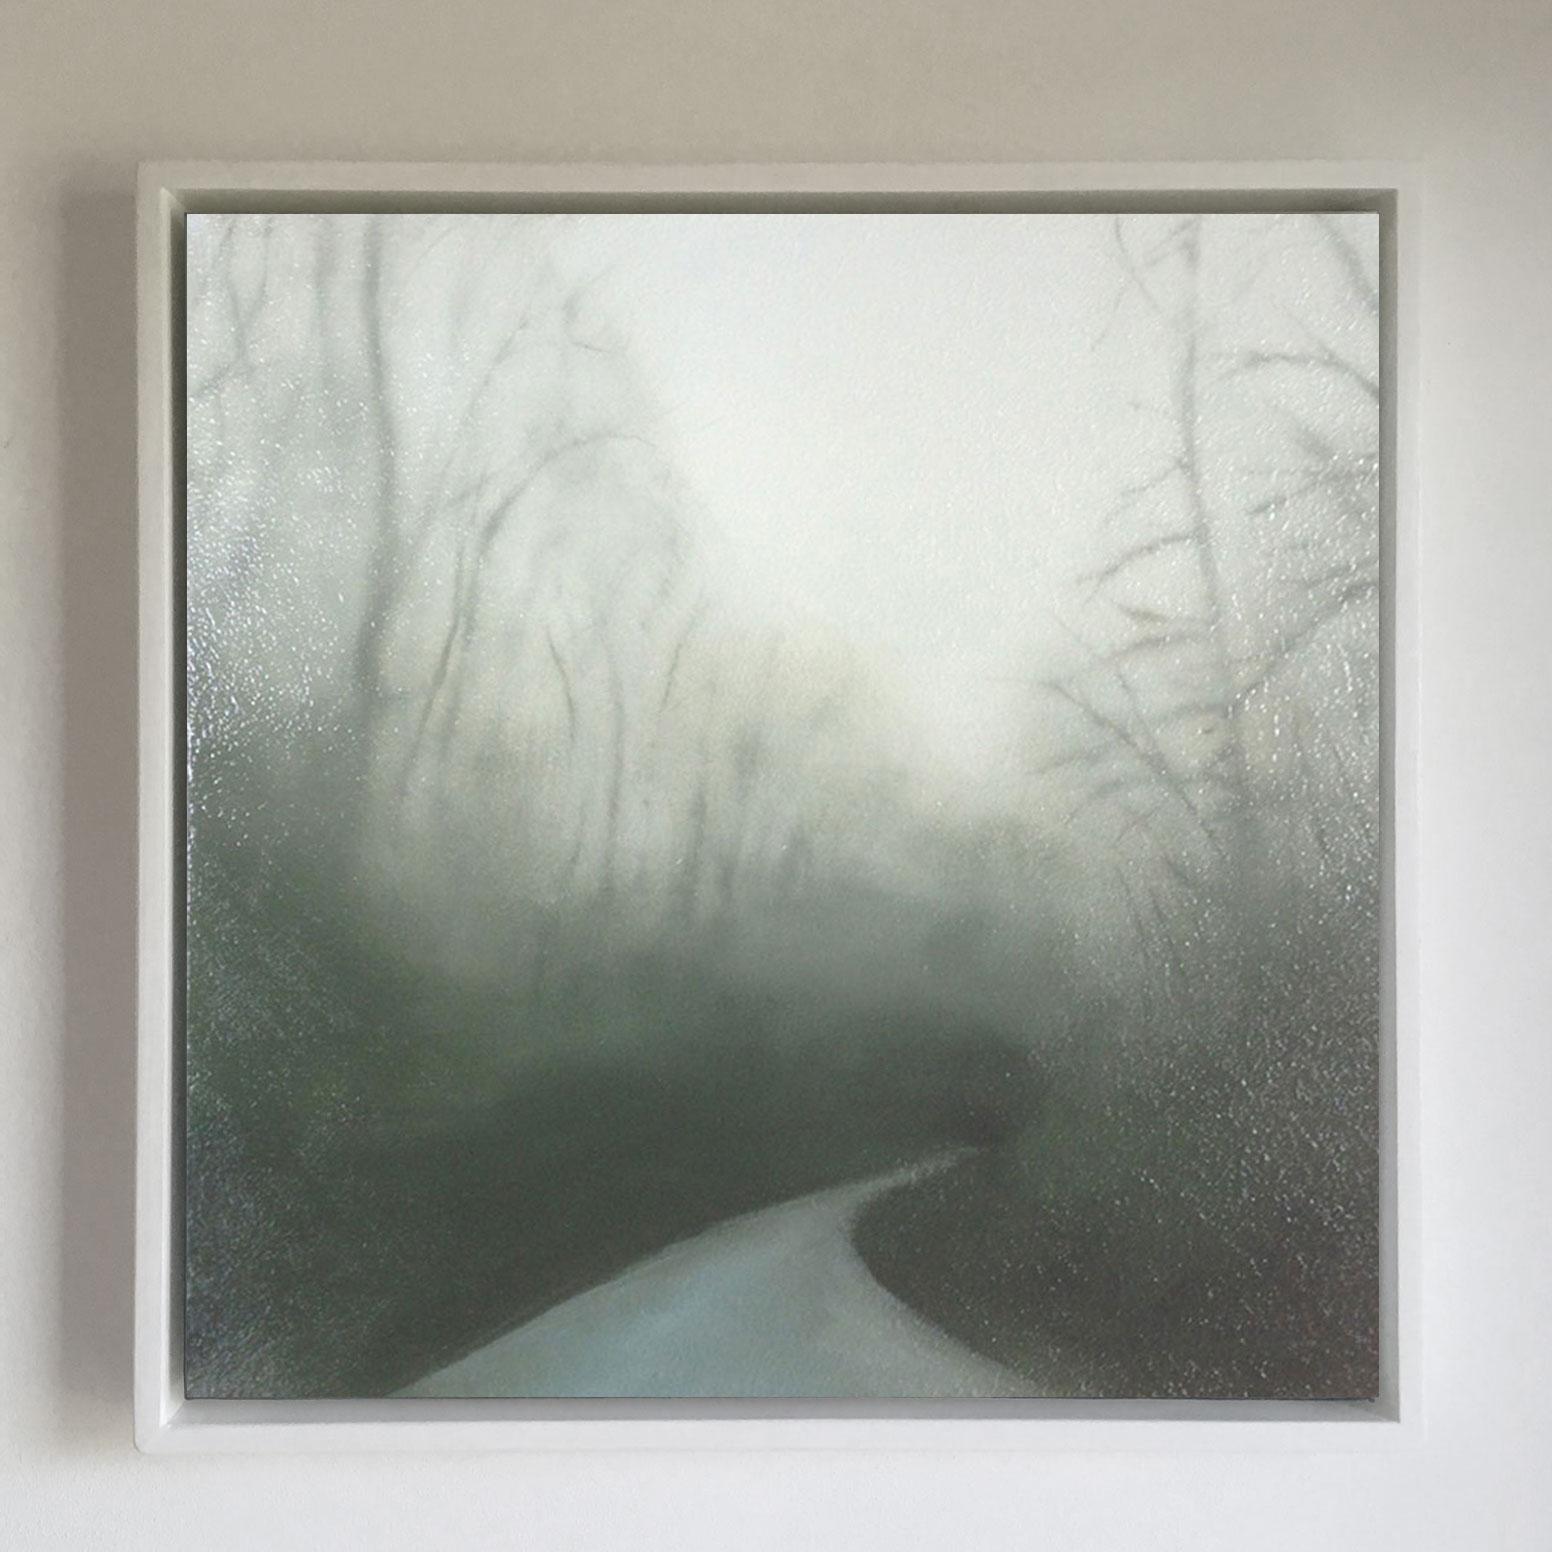 T#100-2016, oil on canvas, 45x45cm, priv. coll.